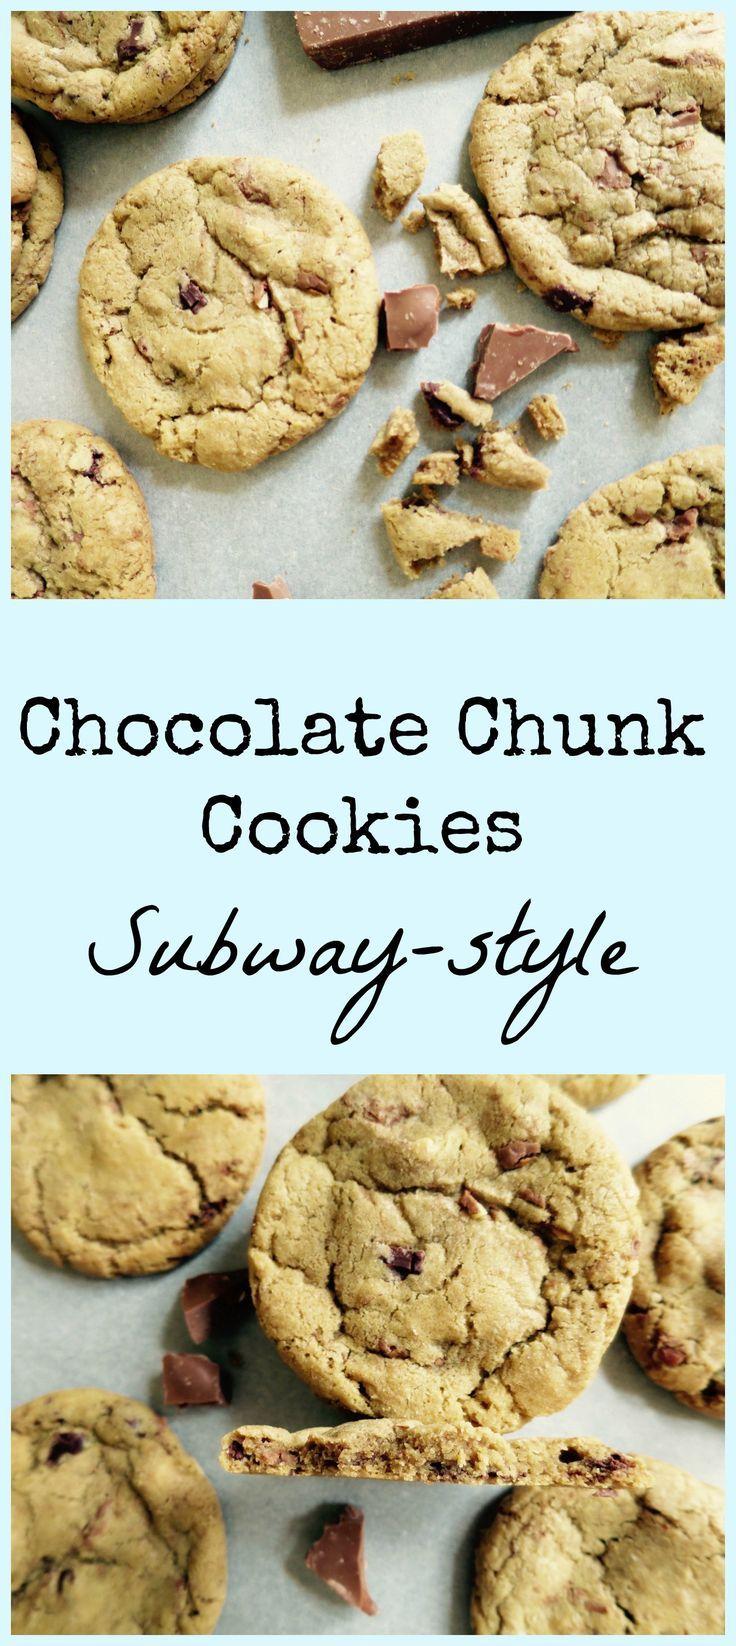 How to make Chocolate Chunk Cookies that taste just like